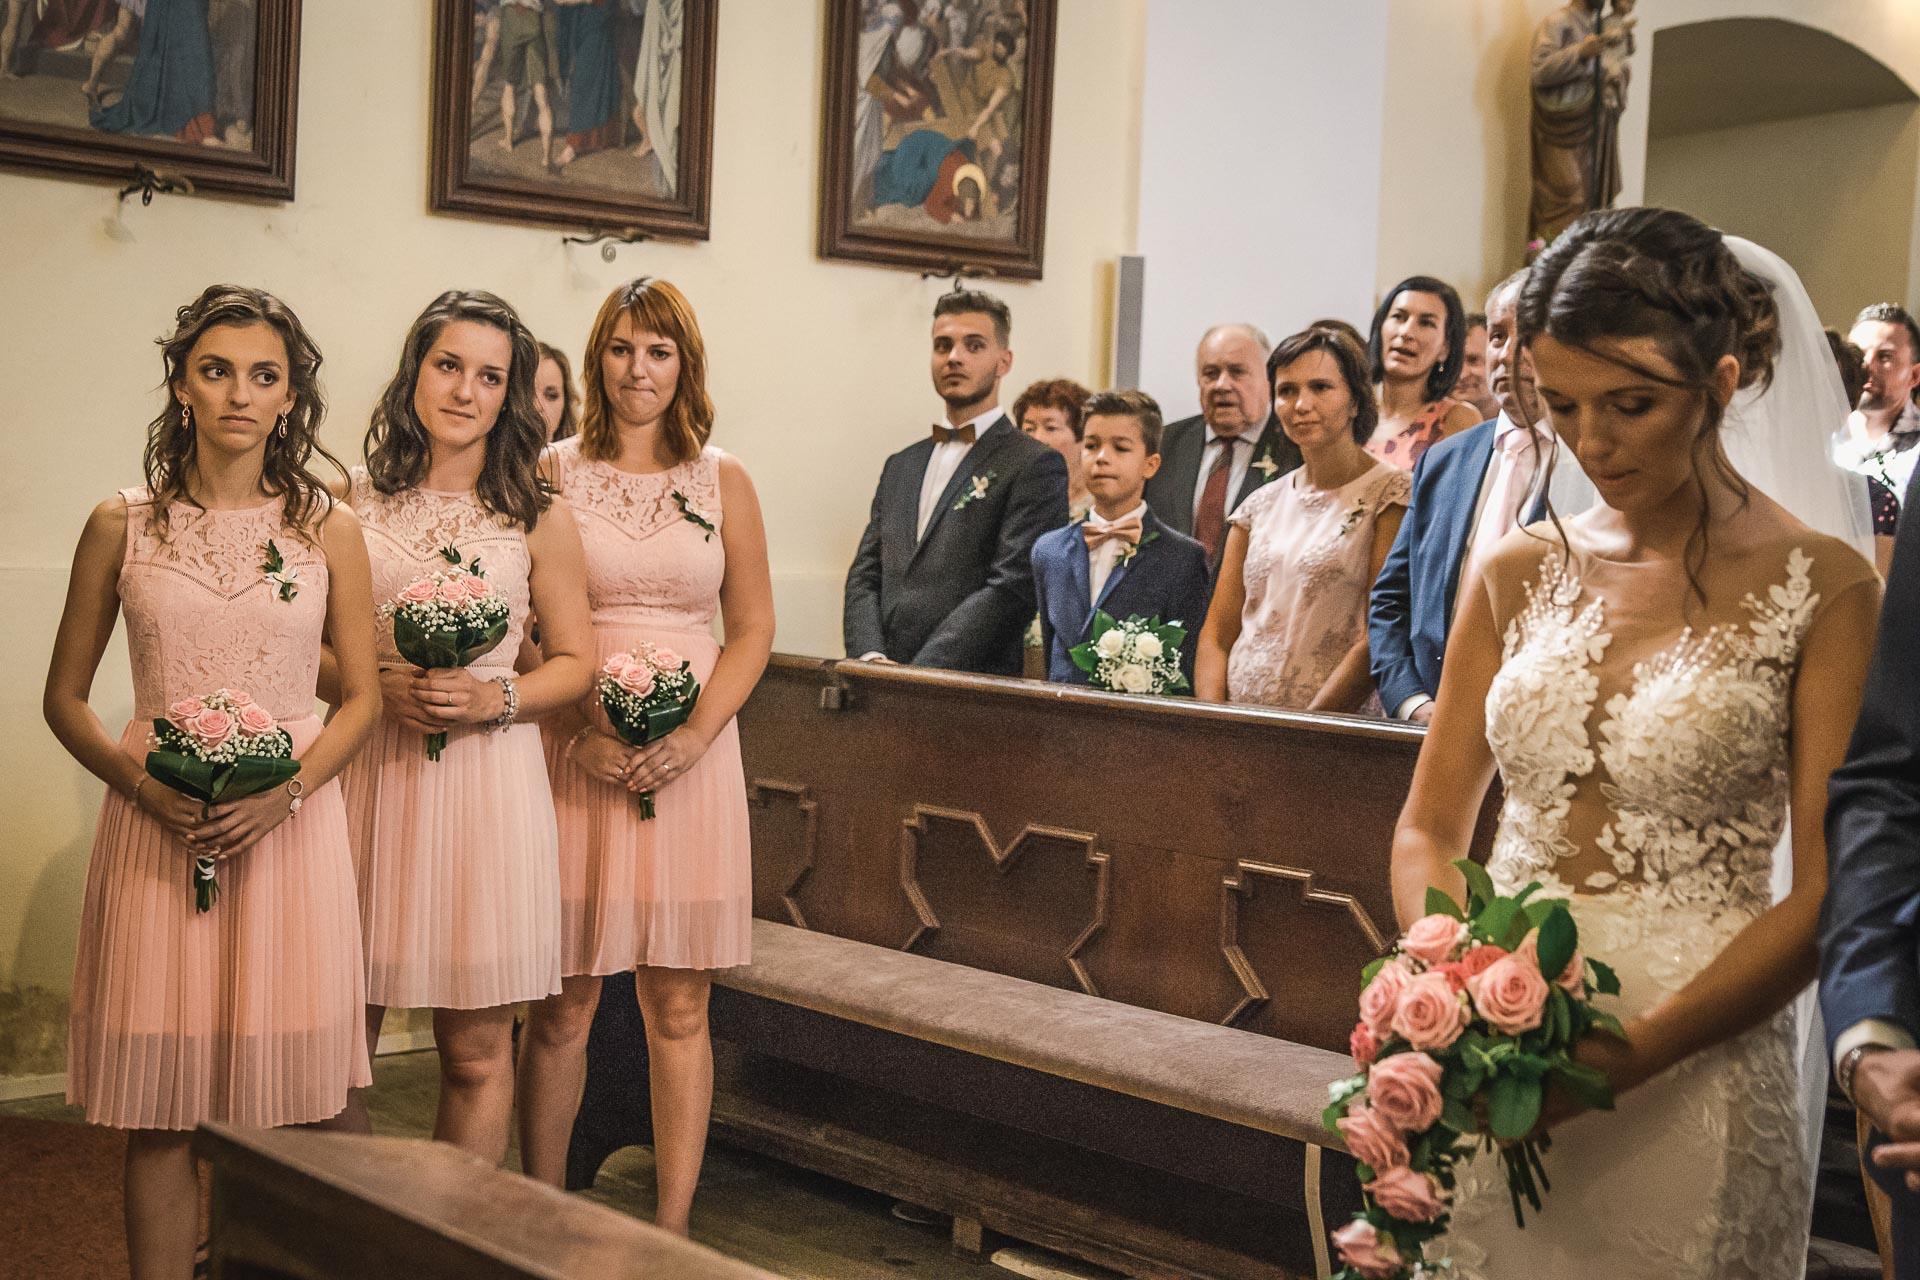 svatební-fotograf-wedding-svatebni-video-orlík-vltava-kostel-statek-stodola-boho-svatba-Beautyfoto-207